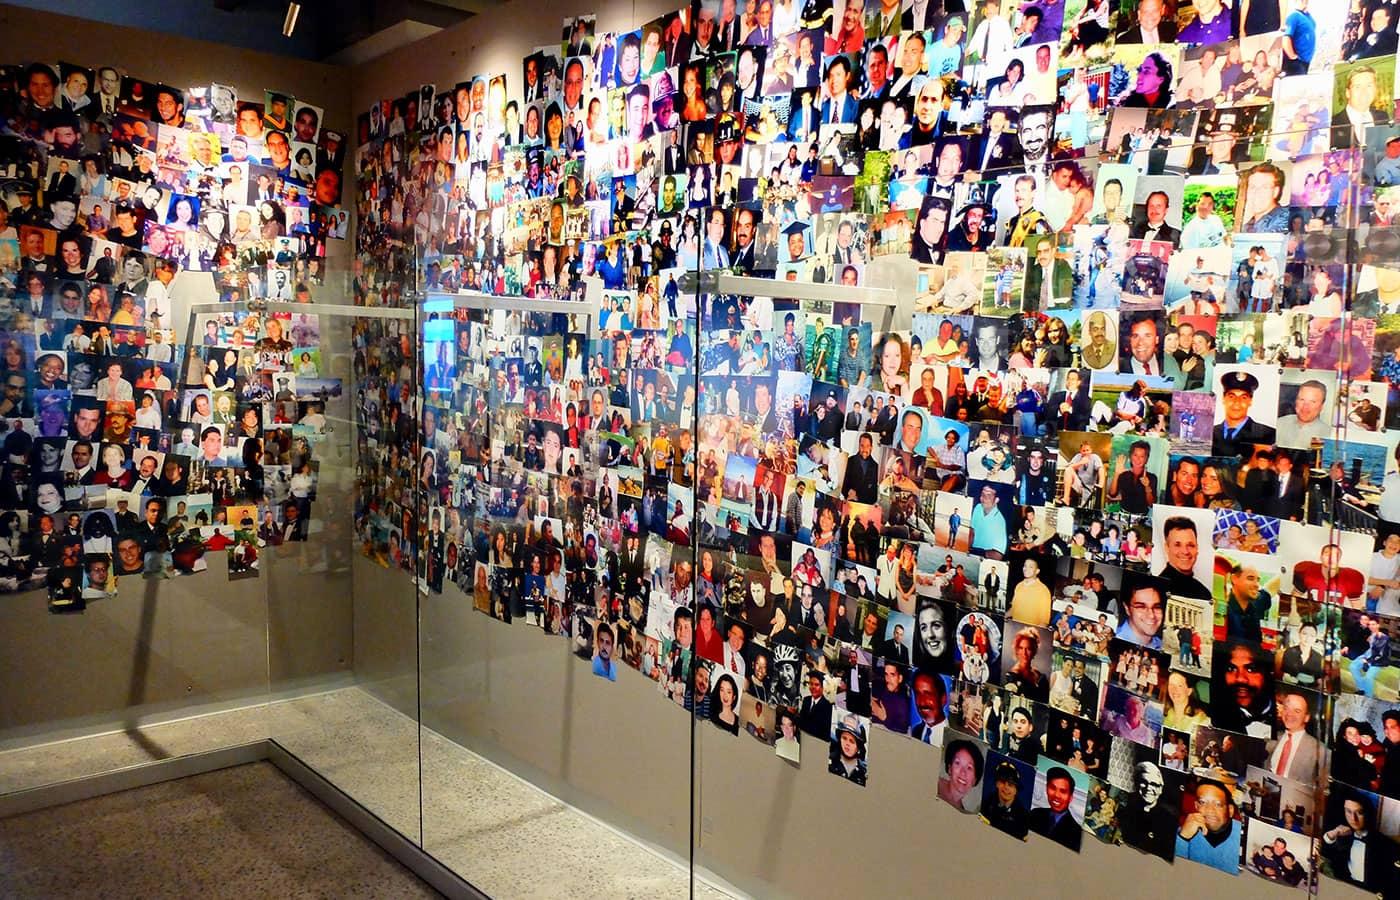 911 Tribute Museum en Nueva York - Muro